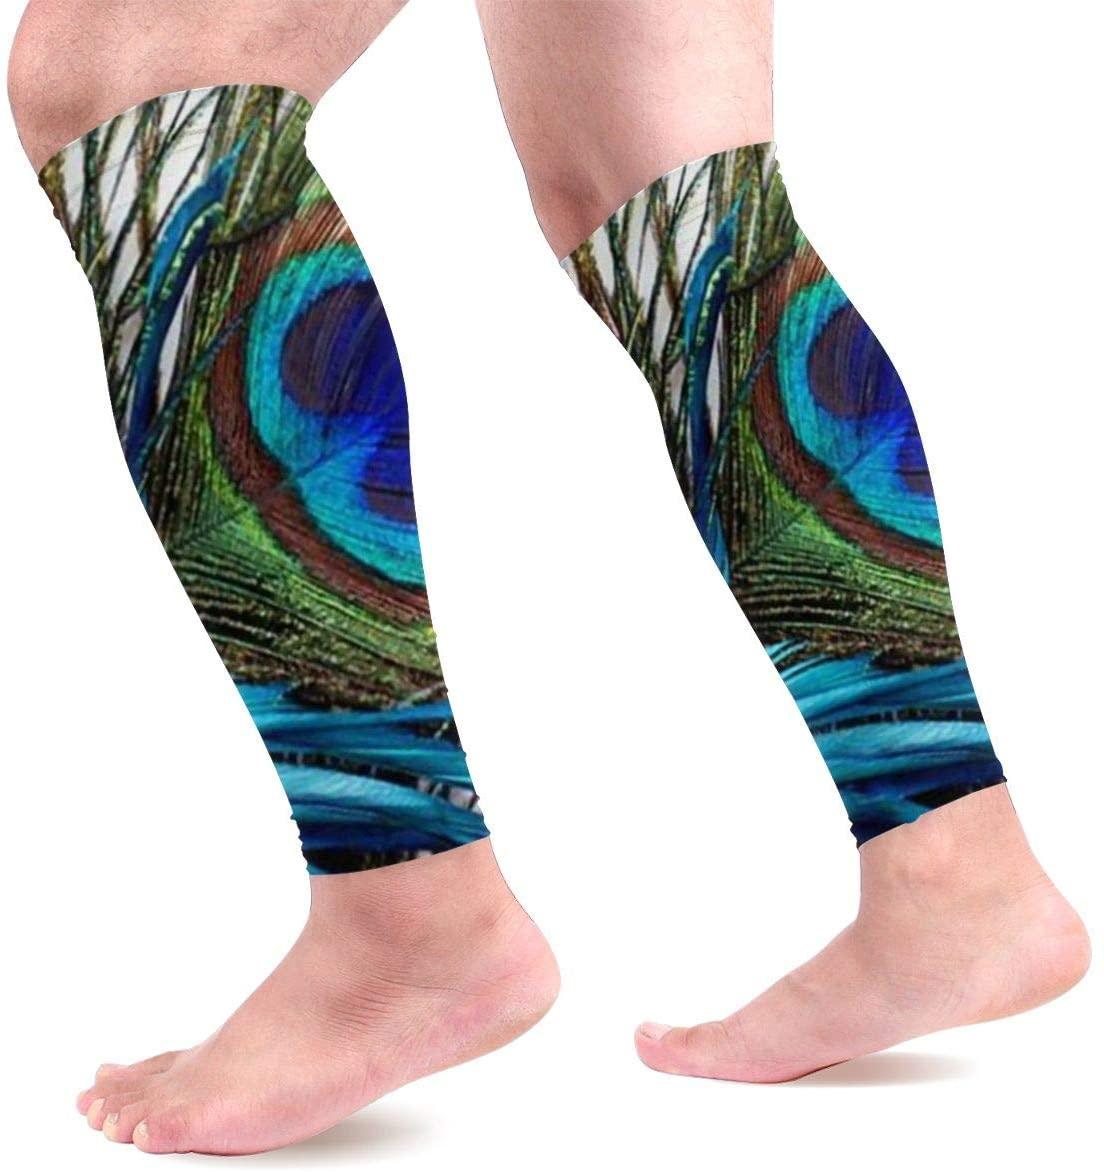 Calf Leg Compression Sleeve for Unisex Peacock Feathers Shin Splints Calf Guard Arm Home Cover